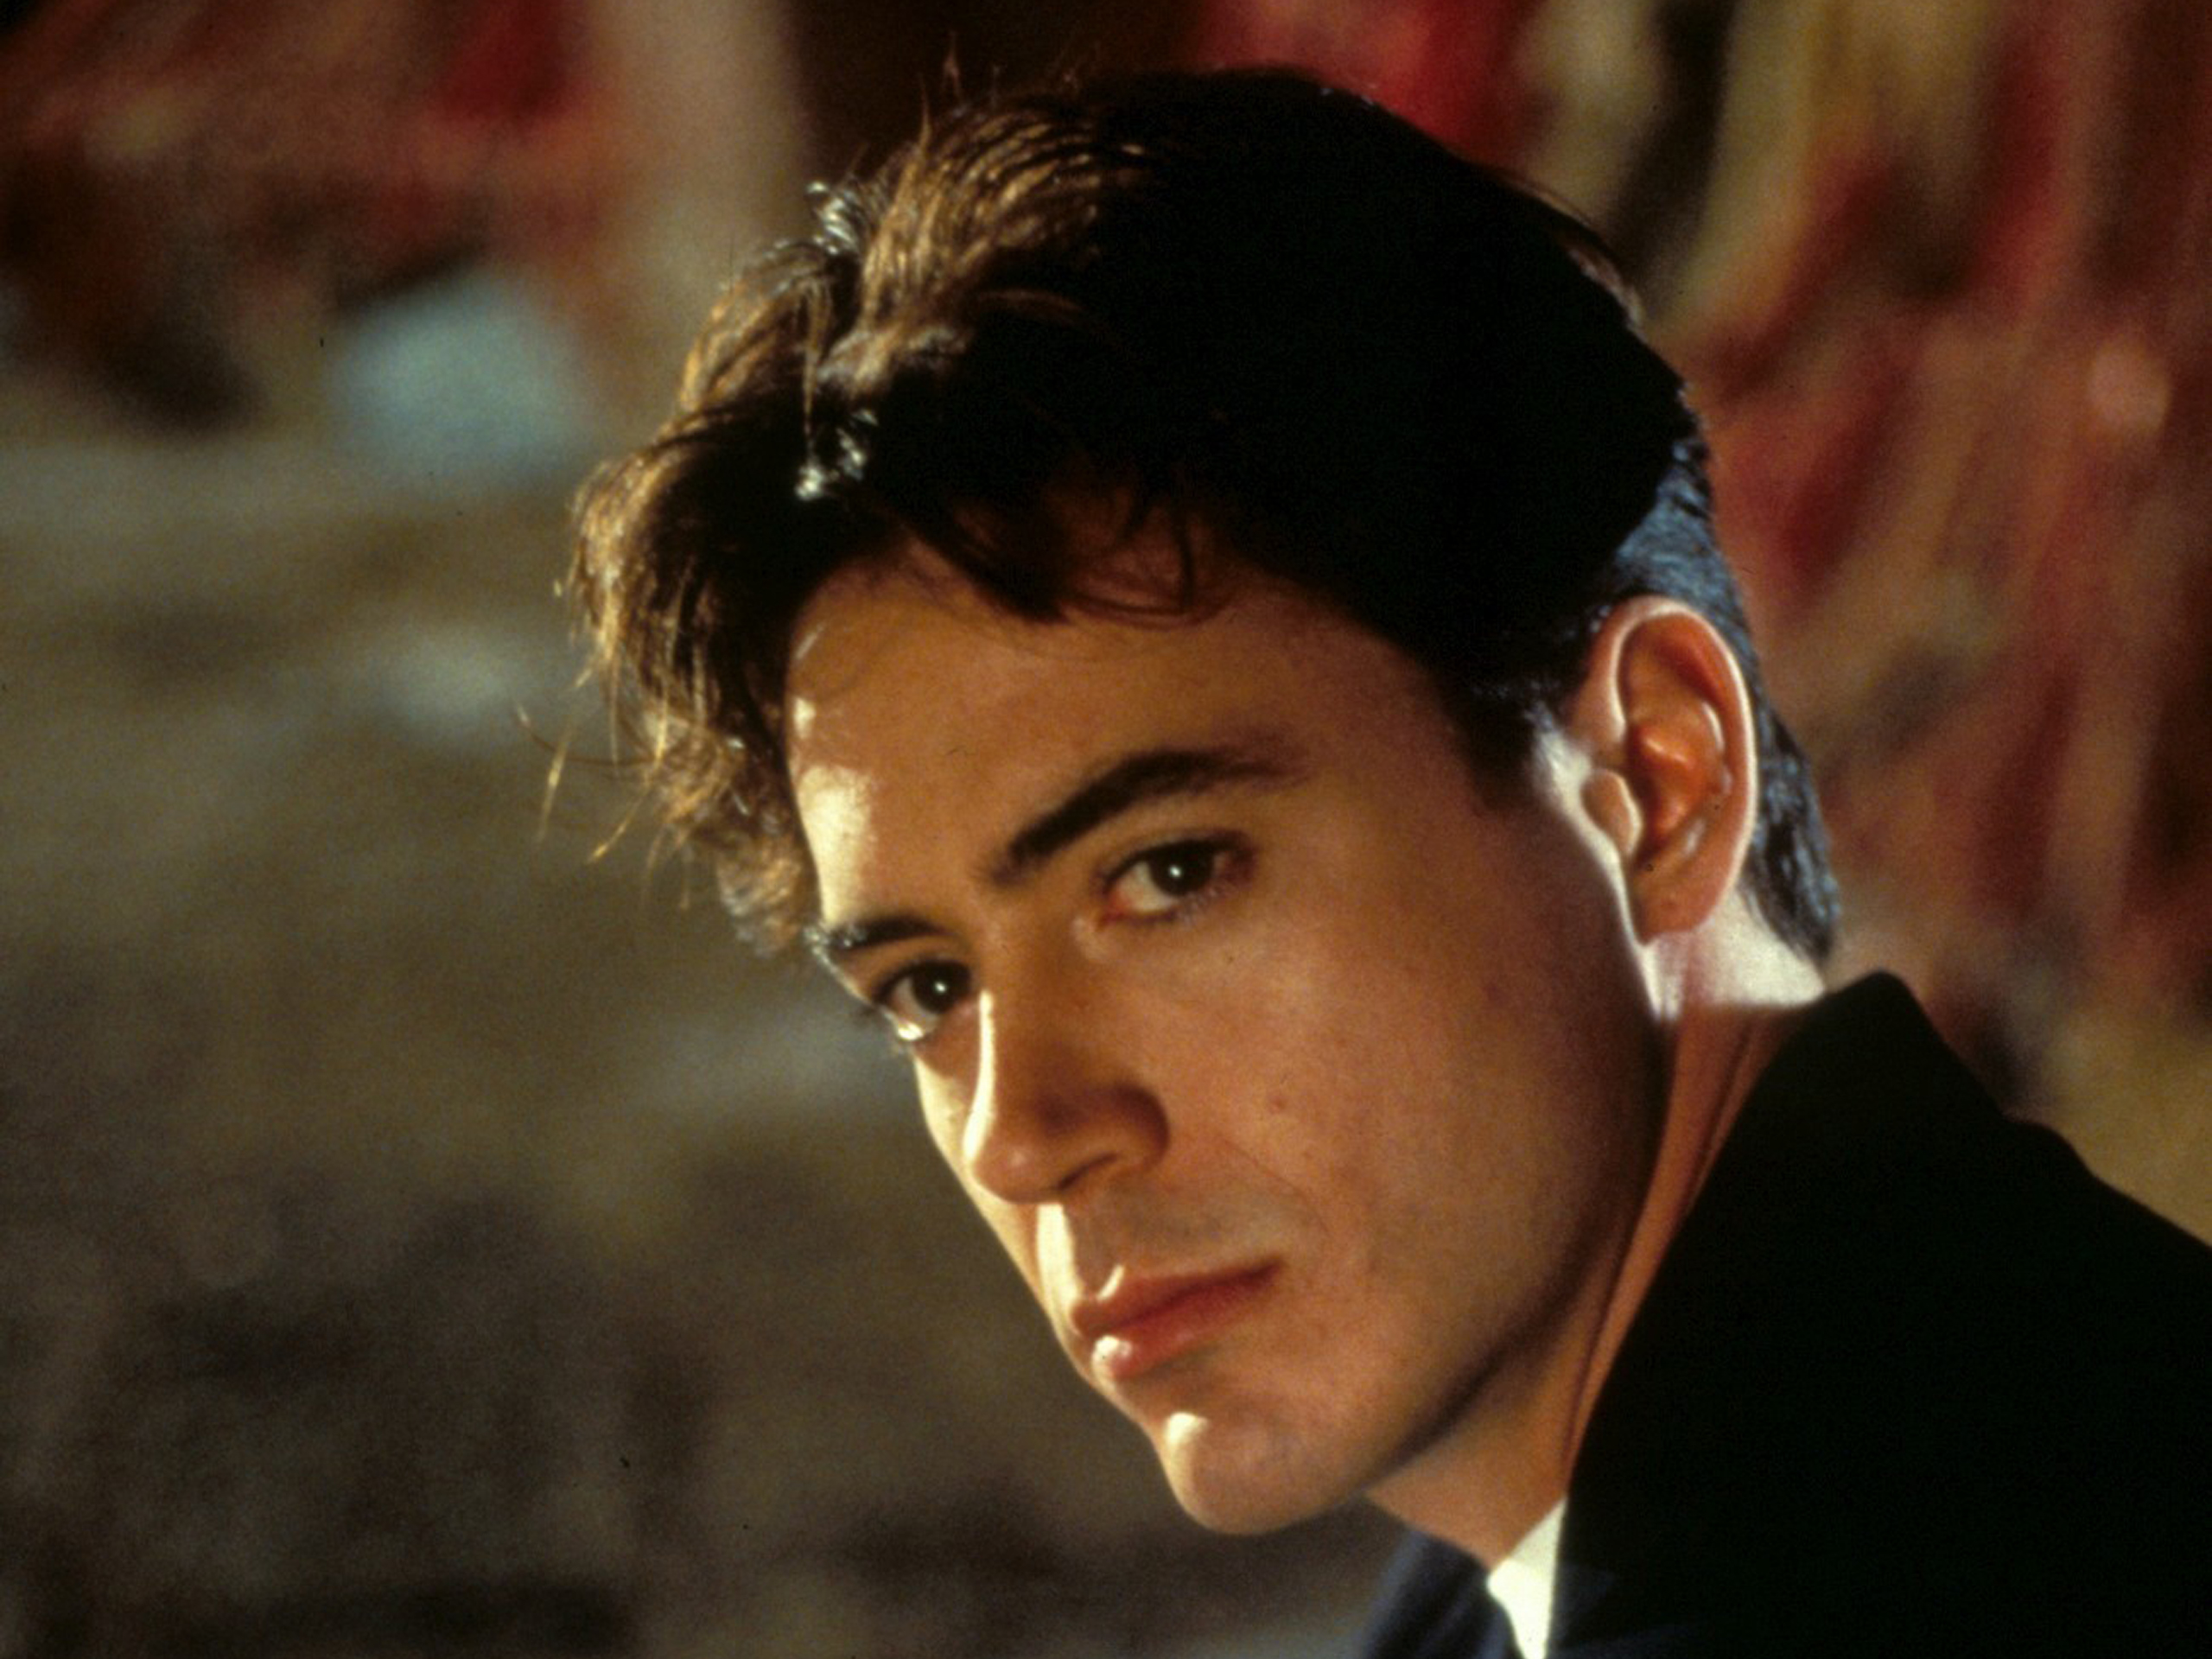 Young Robert Downey Jr Robert Downey